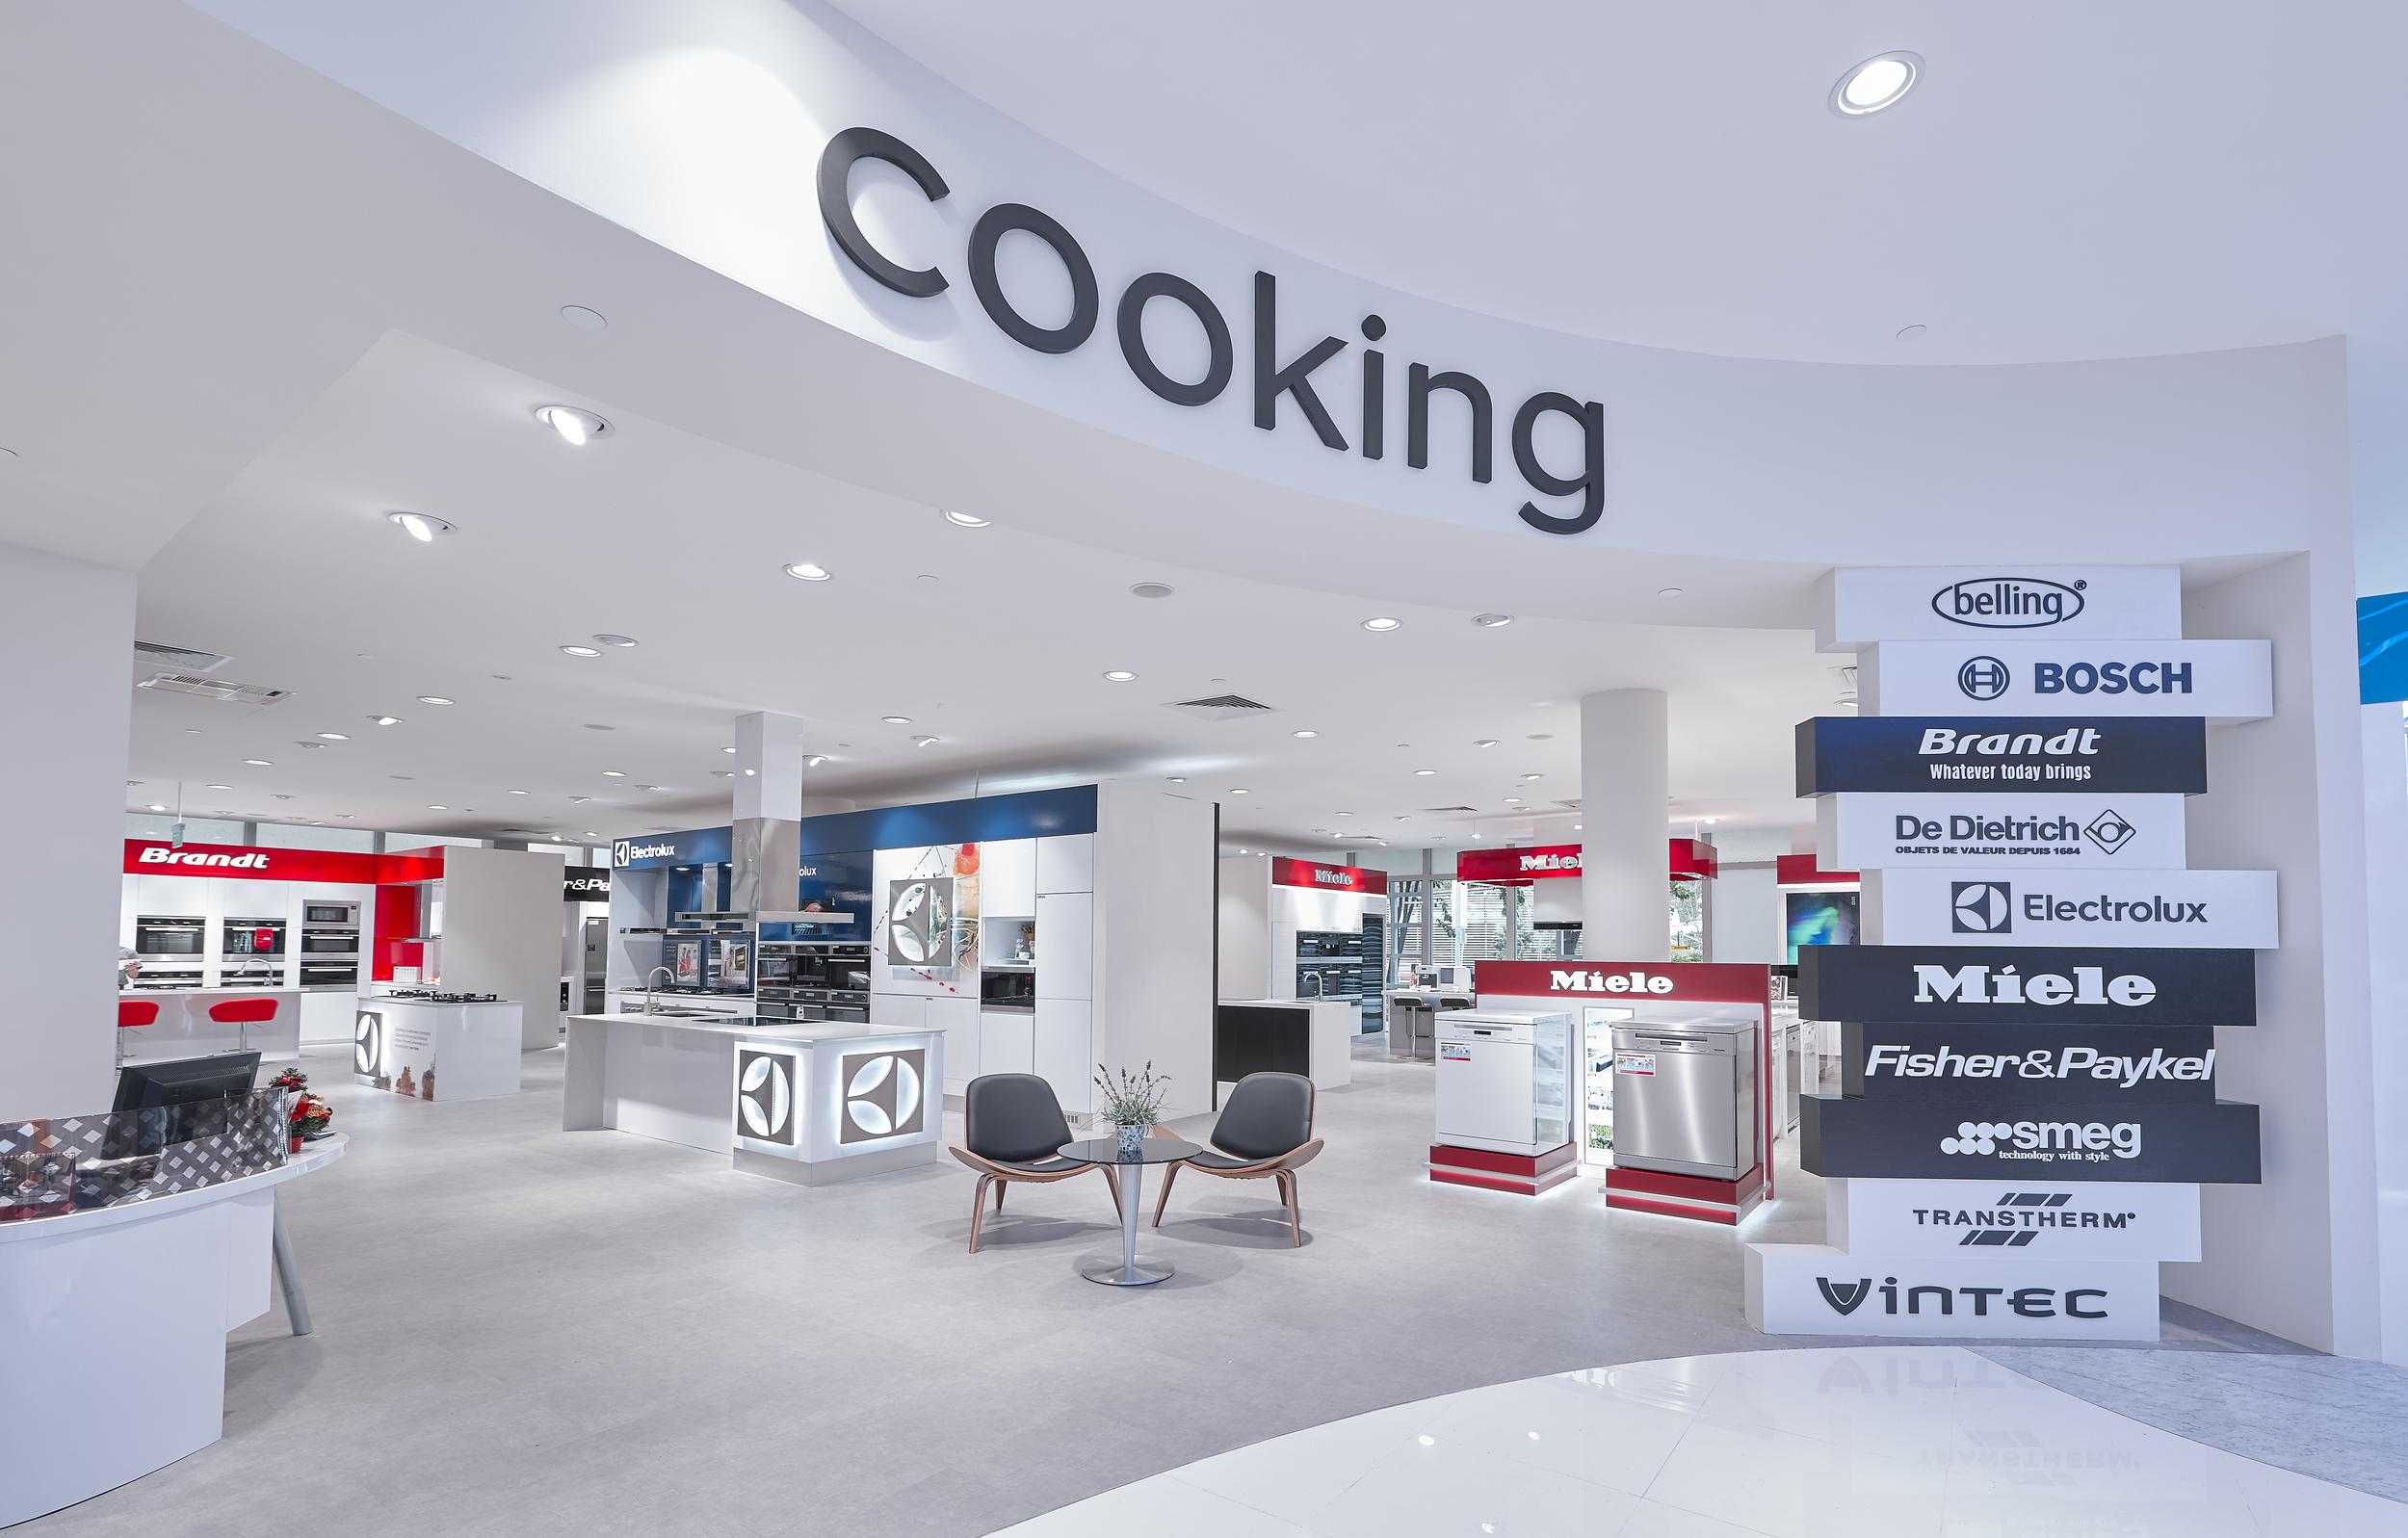 1st_Cooking.jpg